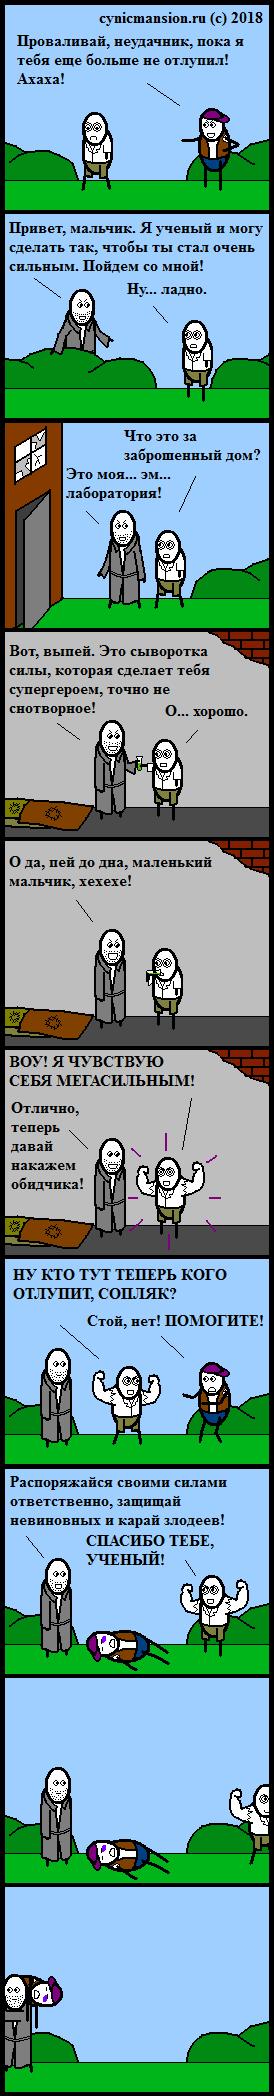 Научное 068cef7b1f8